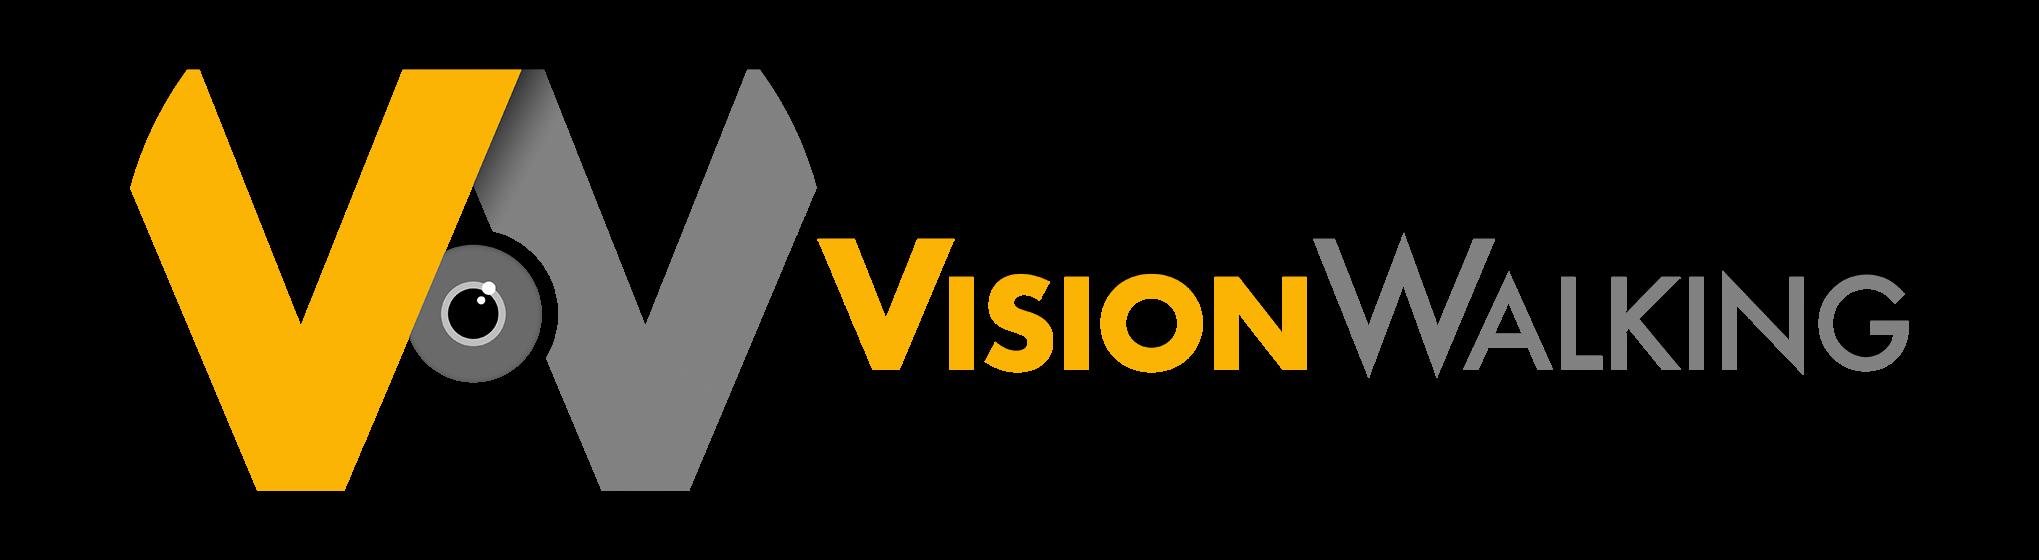 Vision Walking